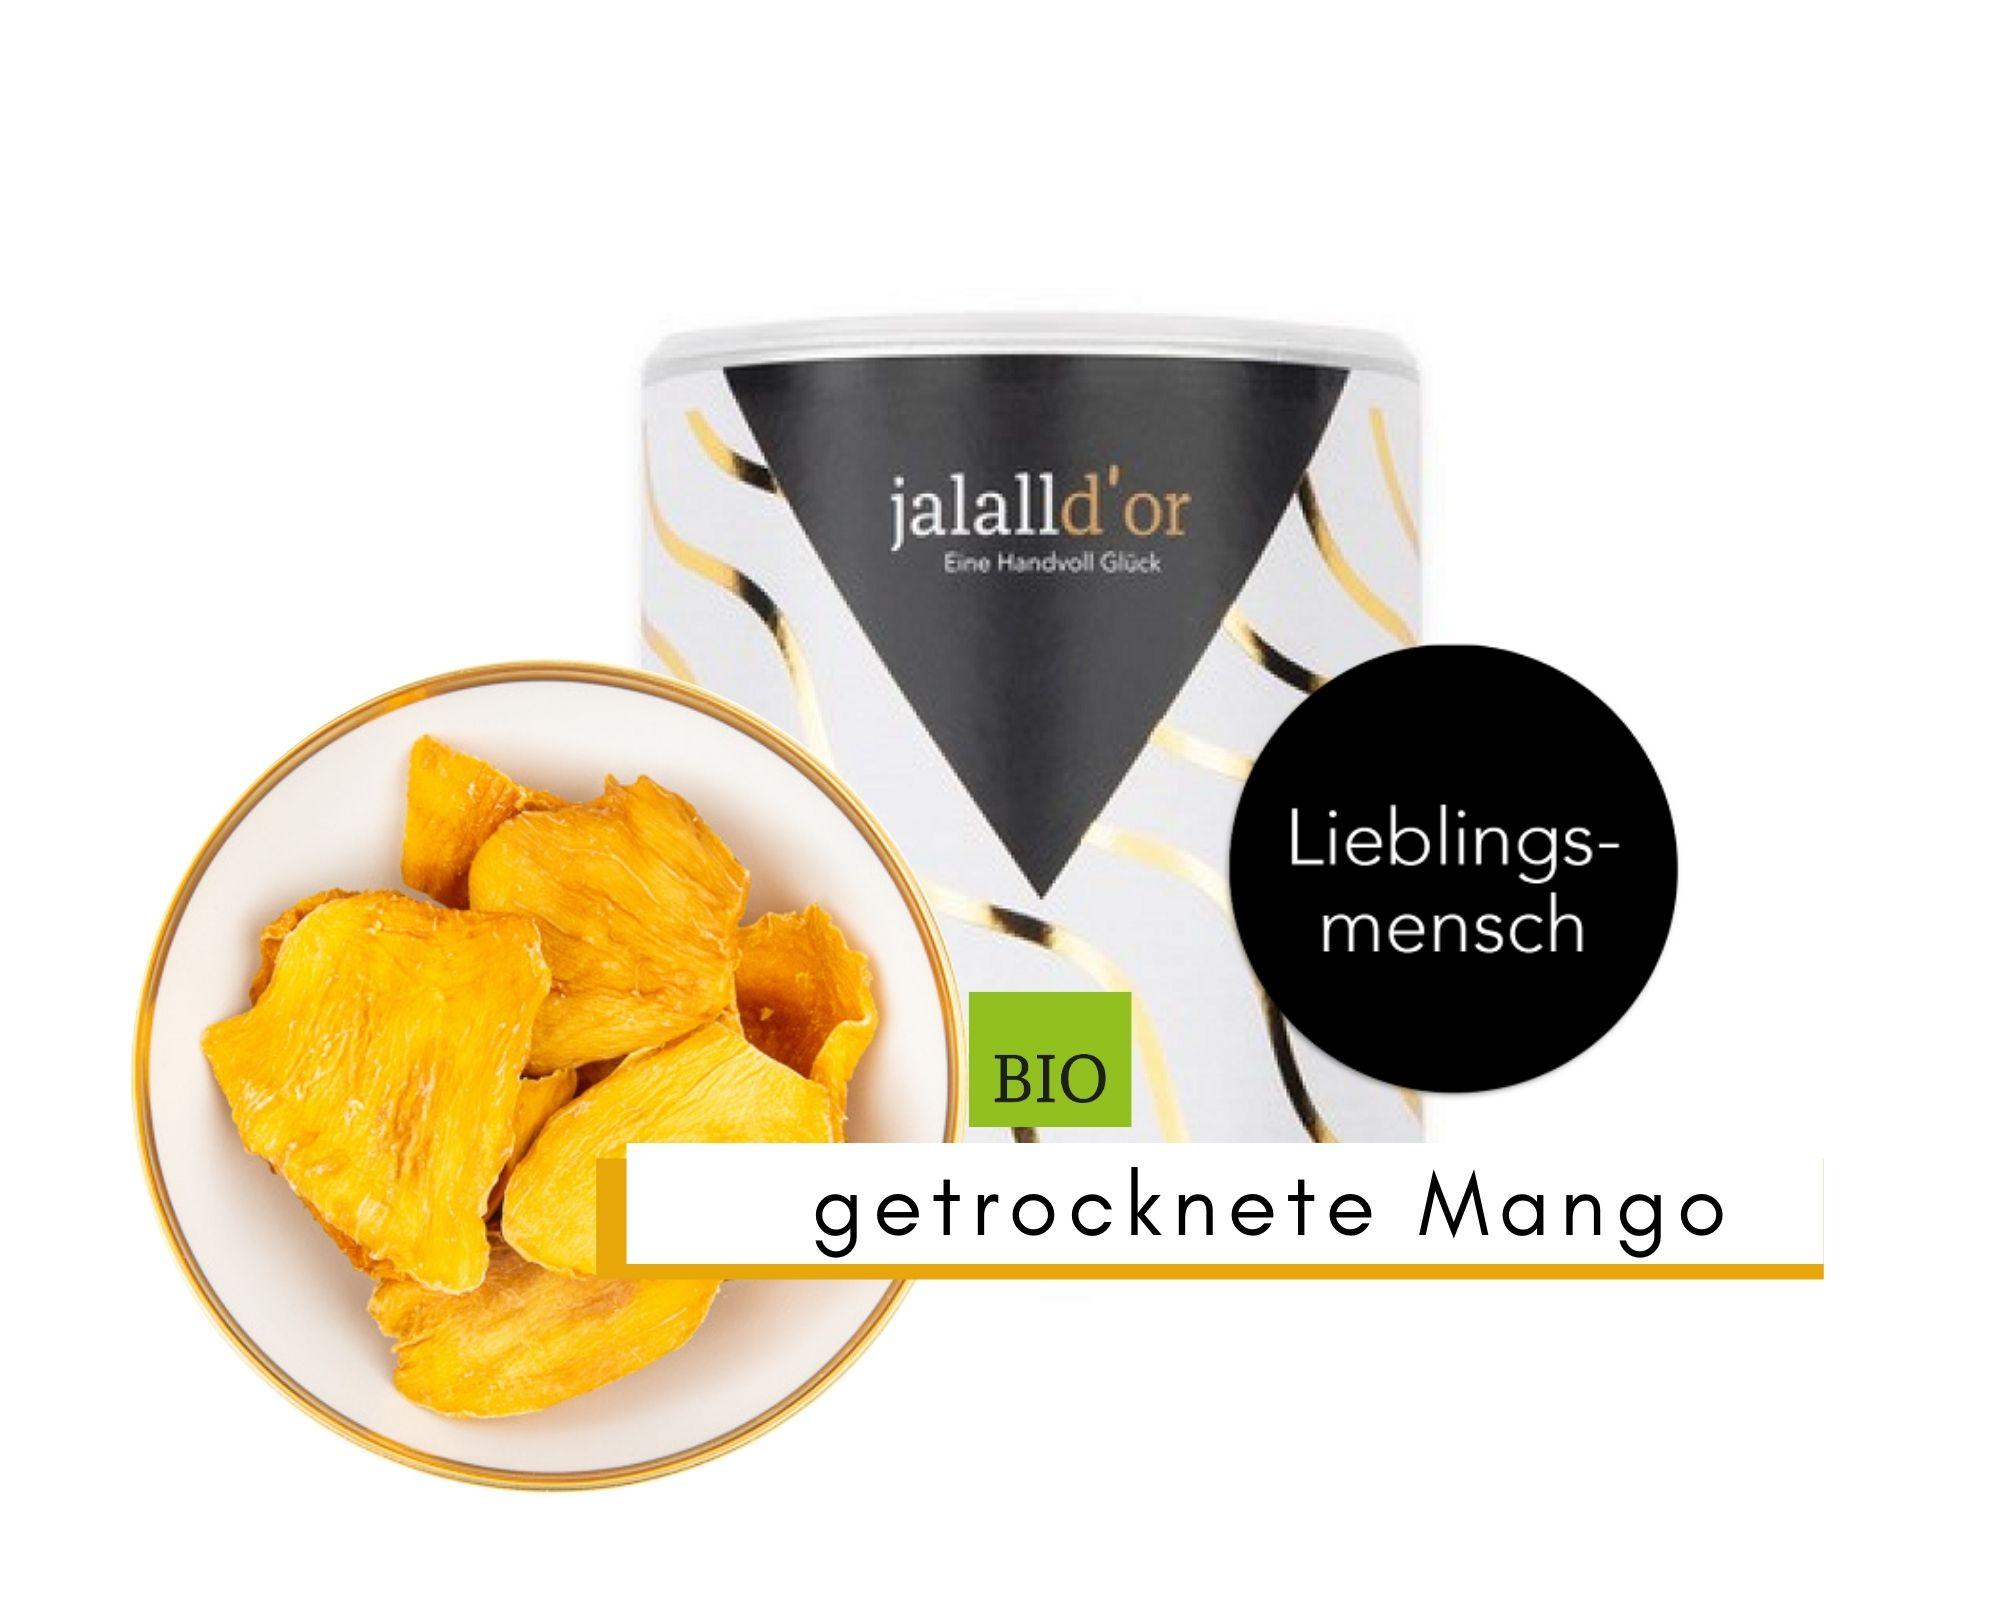 Lieblingsmensch - Mango getrocknet Bio